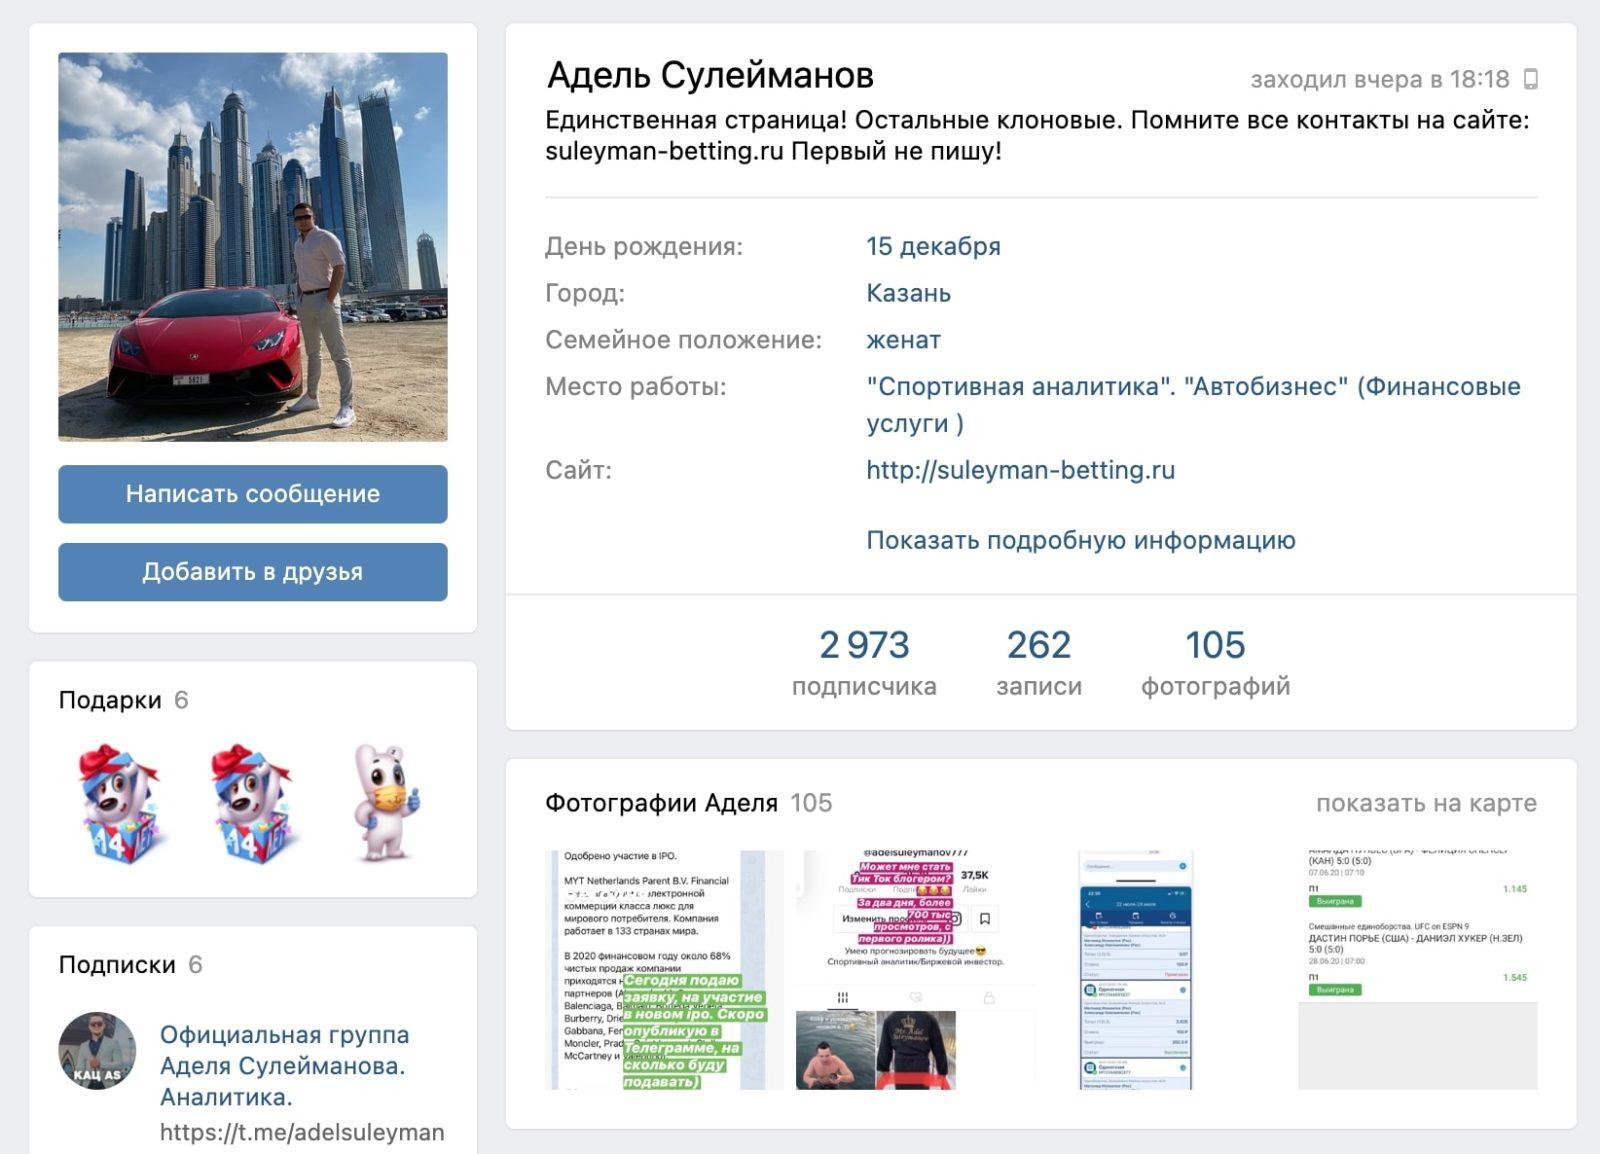 Личная страница админа проекта КАЦ Адель Сулейманов (Suleyman Betting ru)